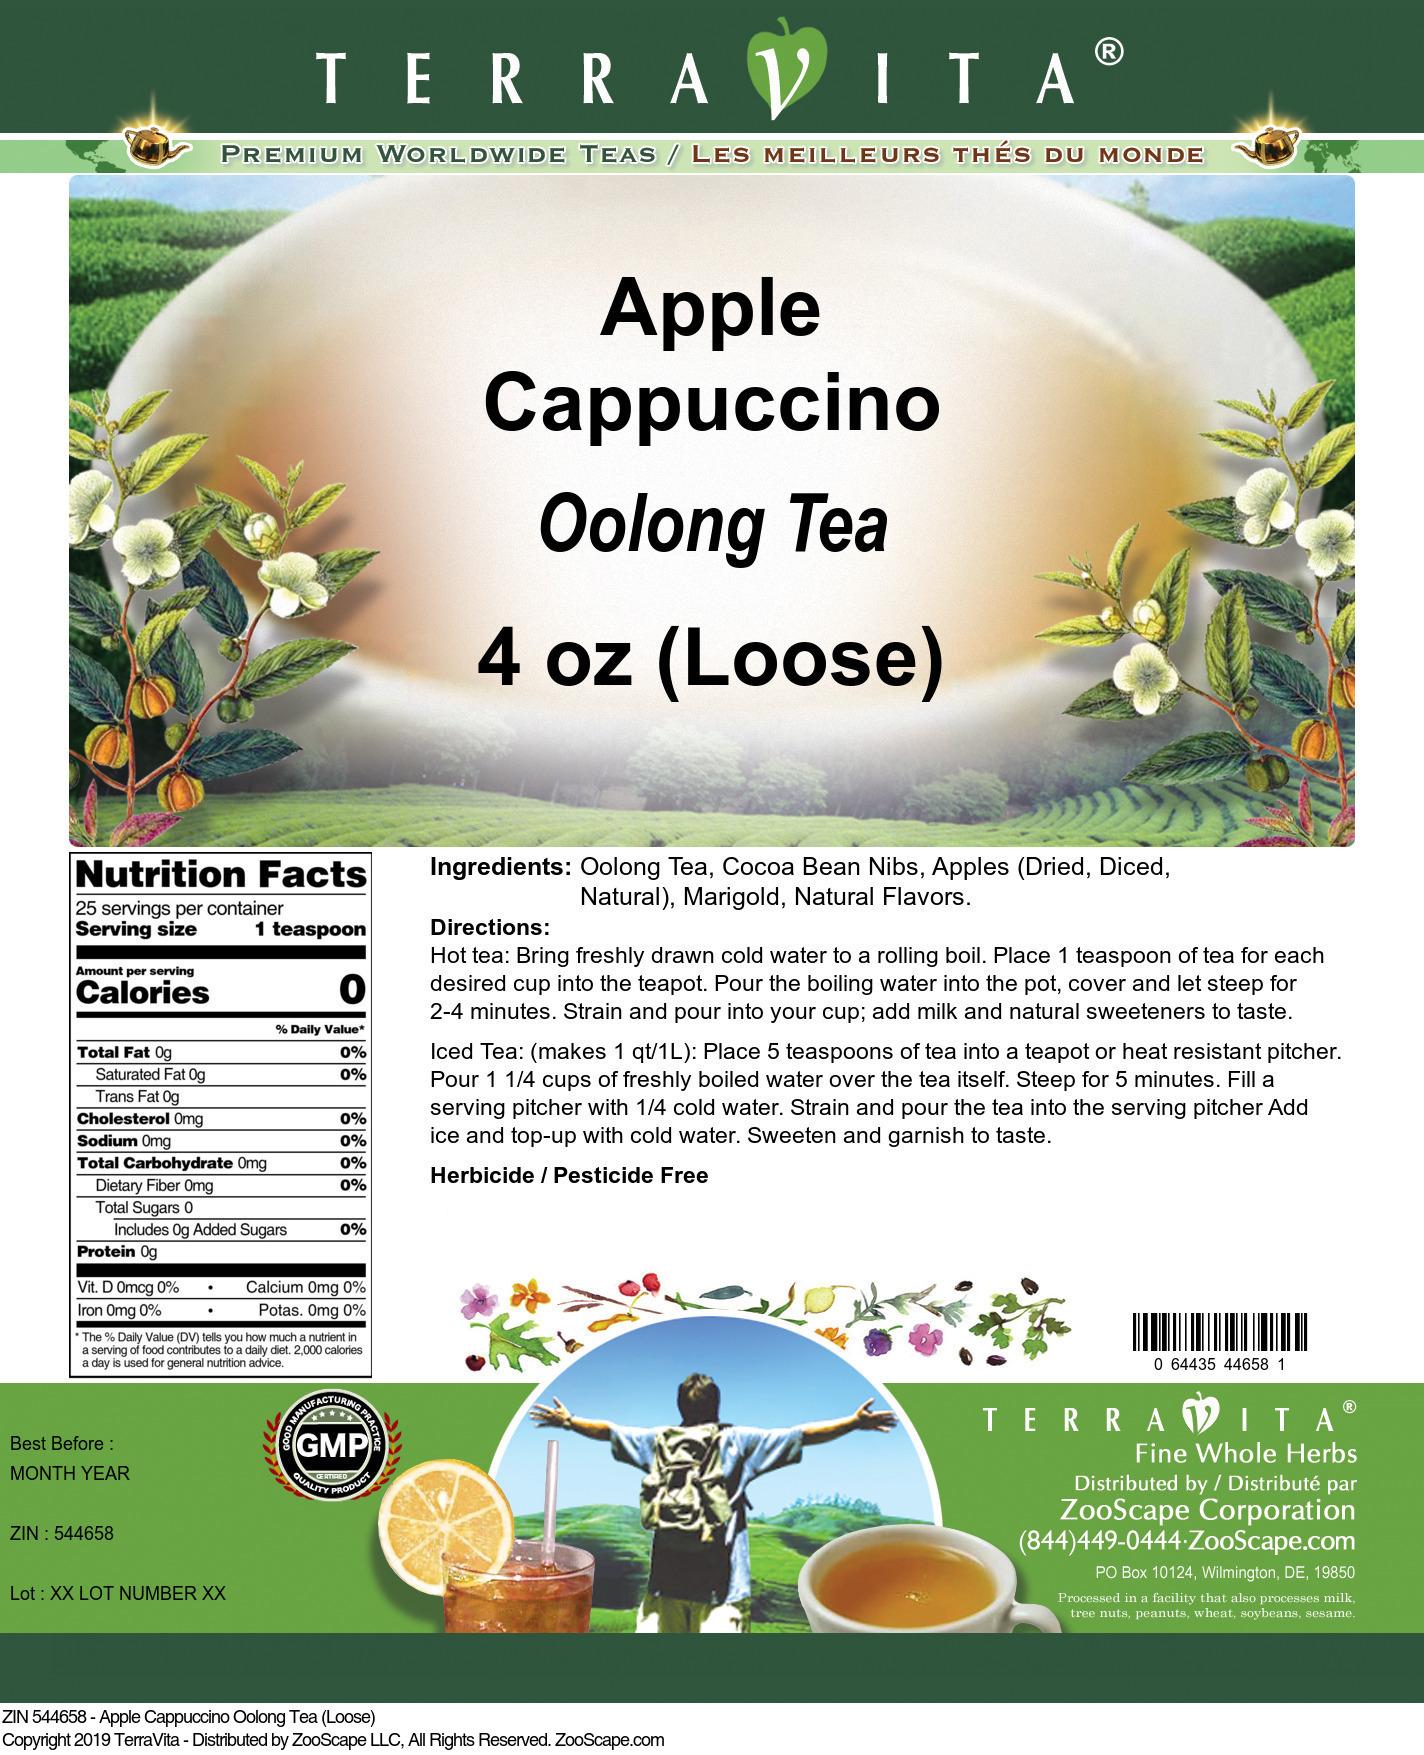 Apple Cappuccino Oolong Tea